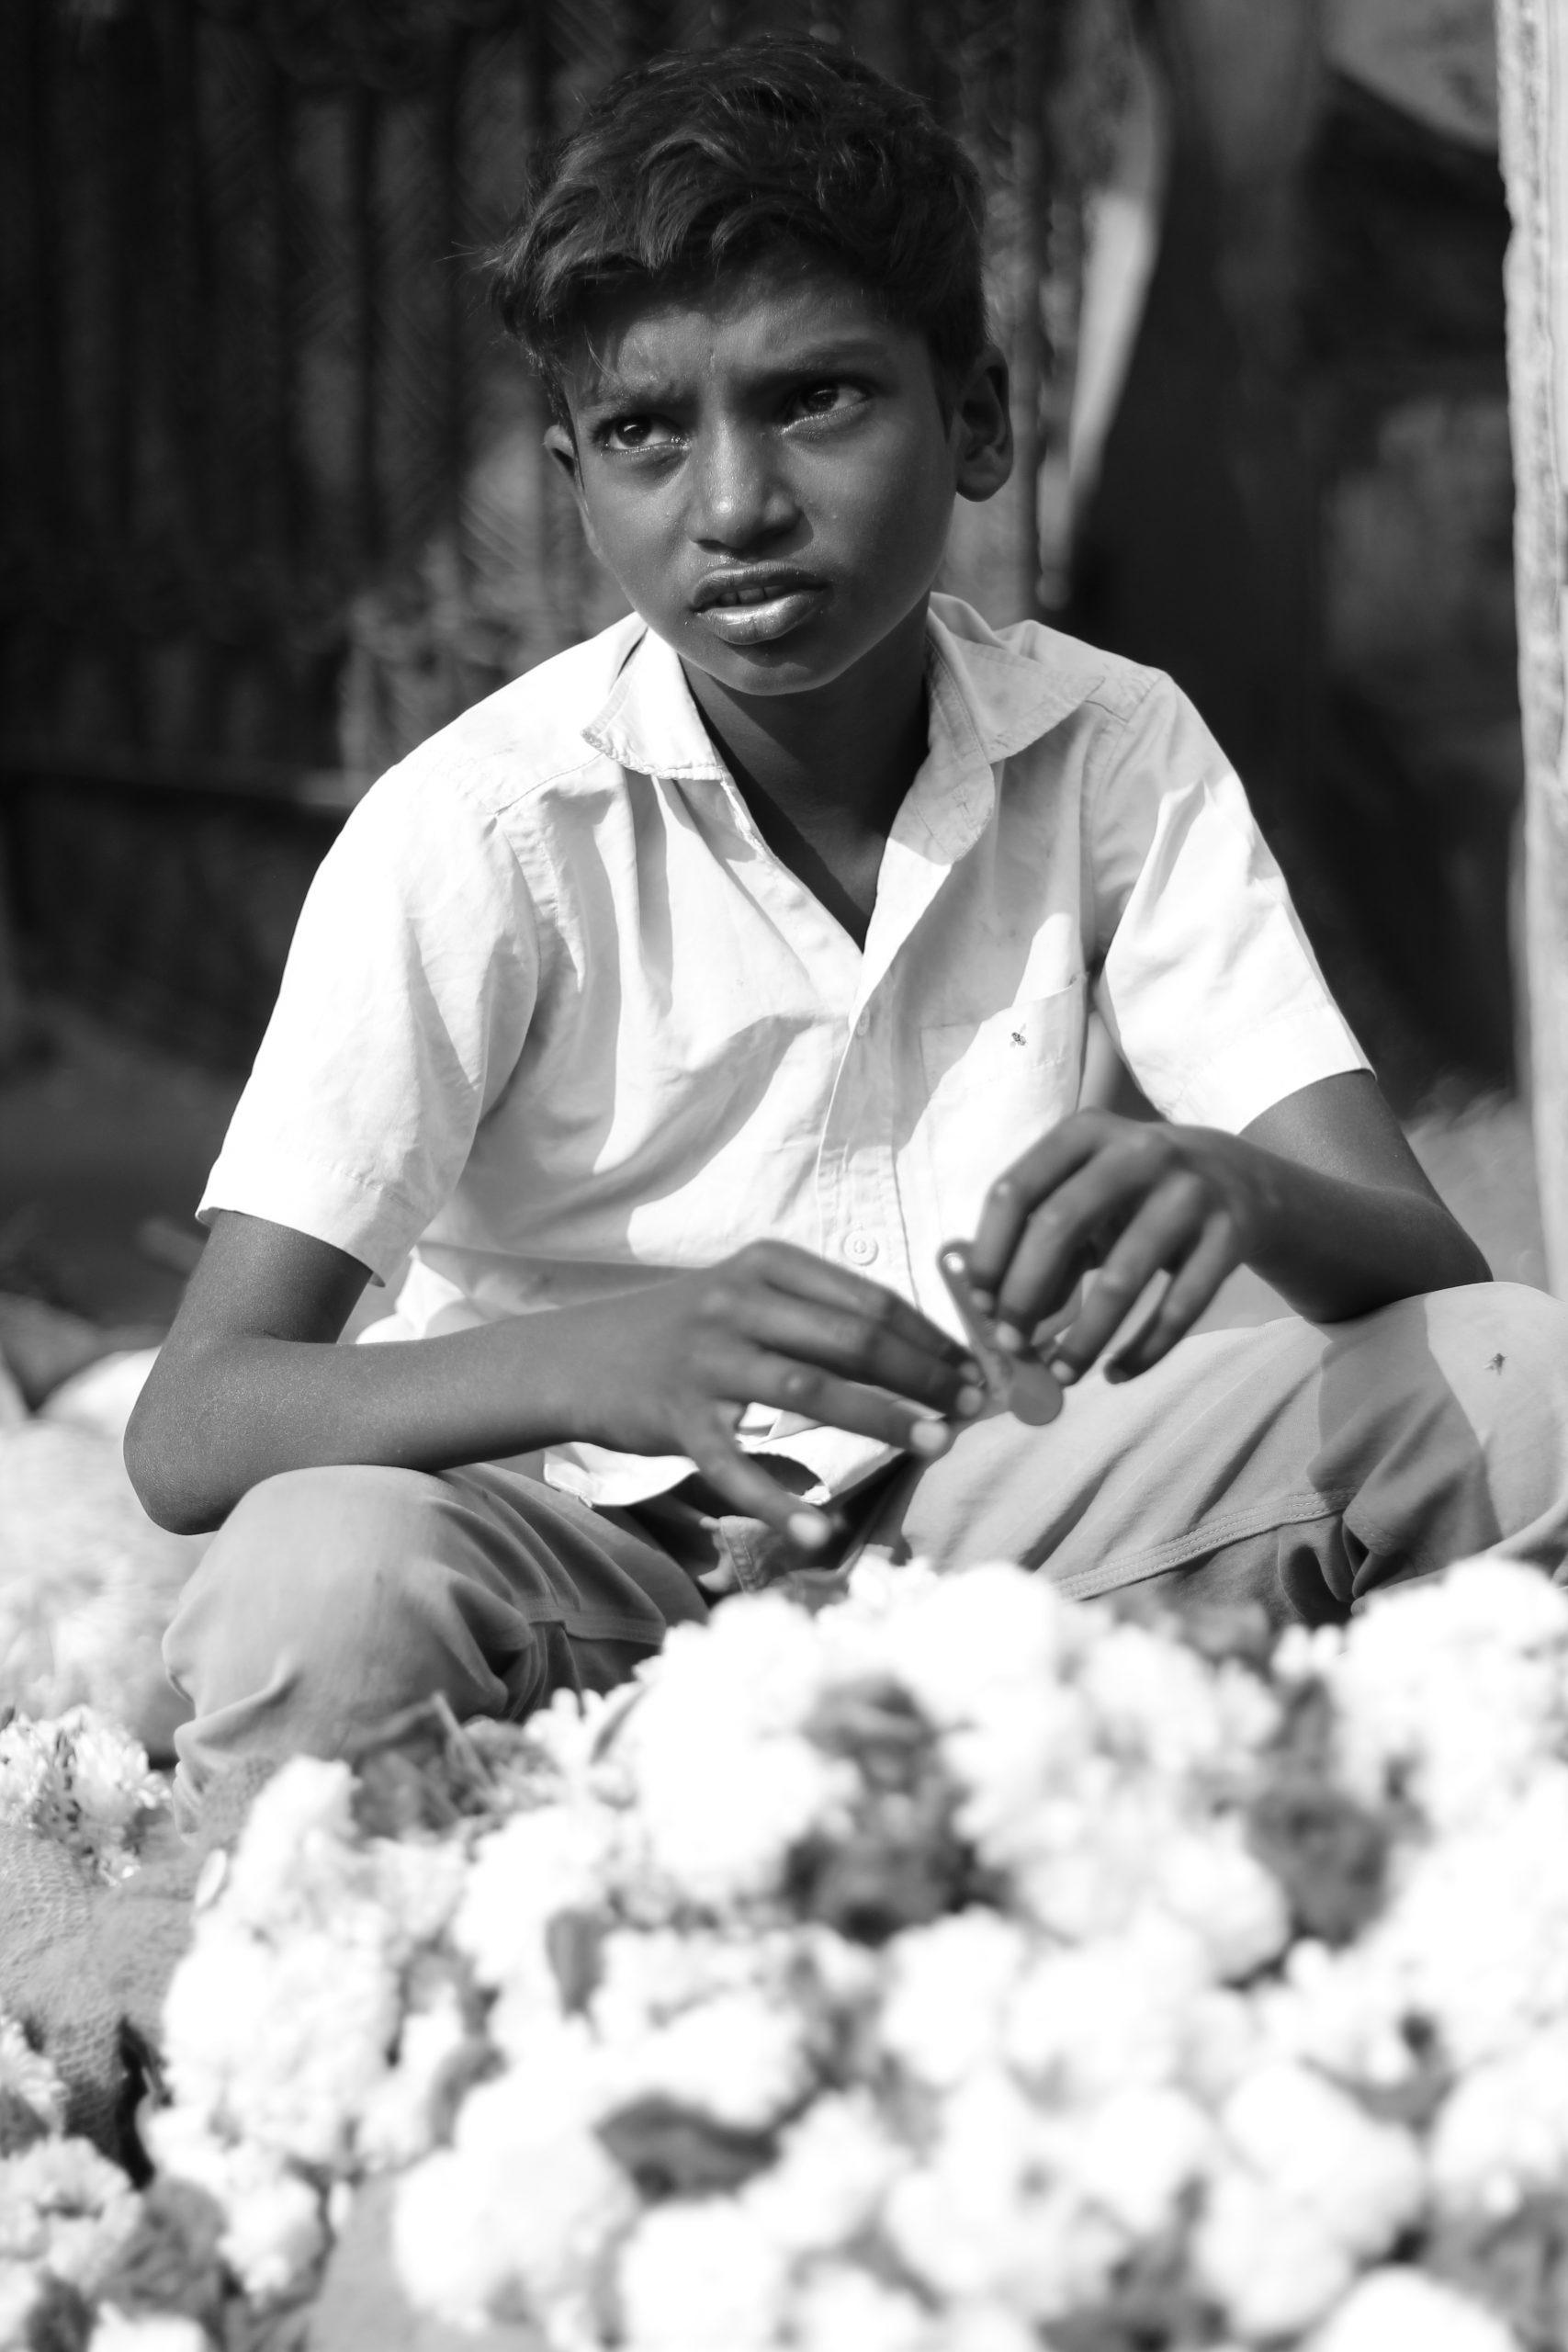 A boy selling cut flowers